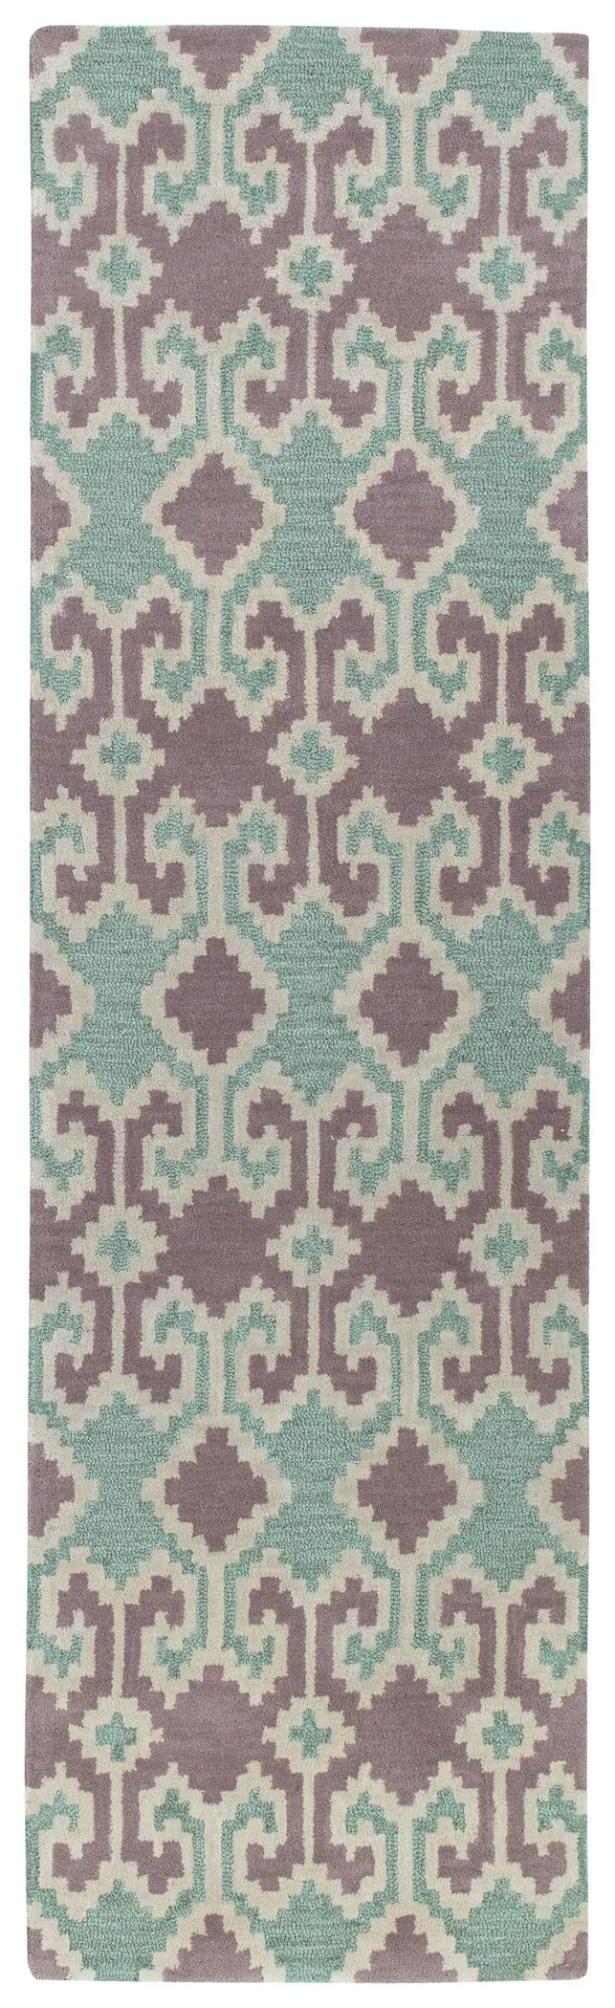 Hinton Charterhouse Hand-Tufted Purple Area Rug Rug Size: Runner 2'3